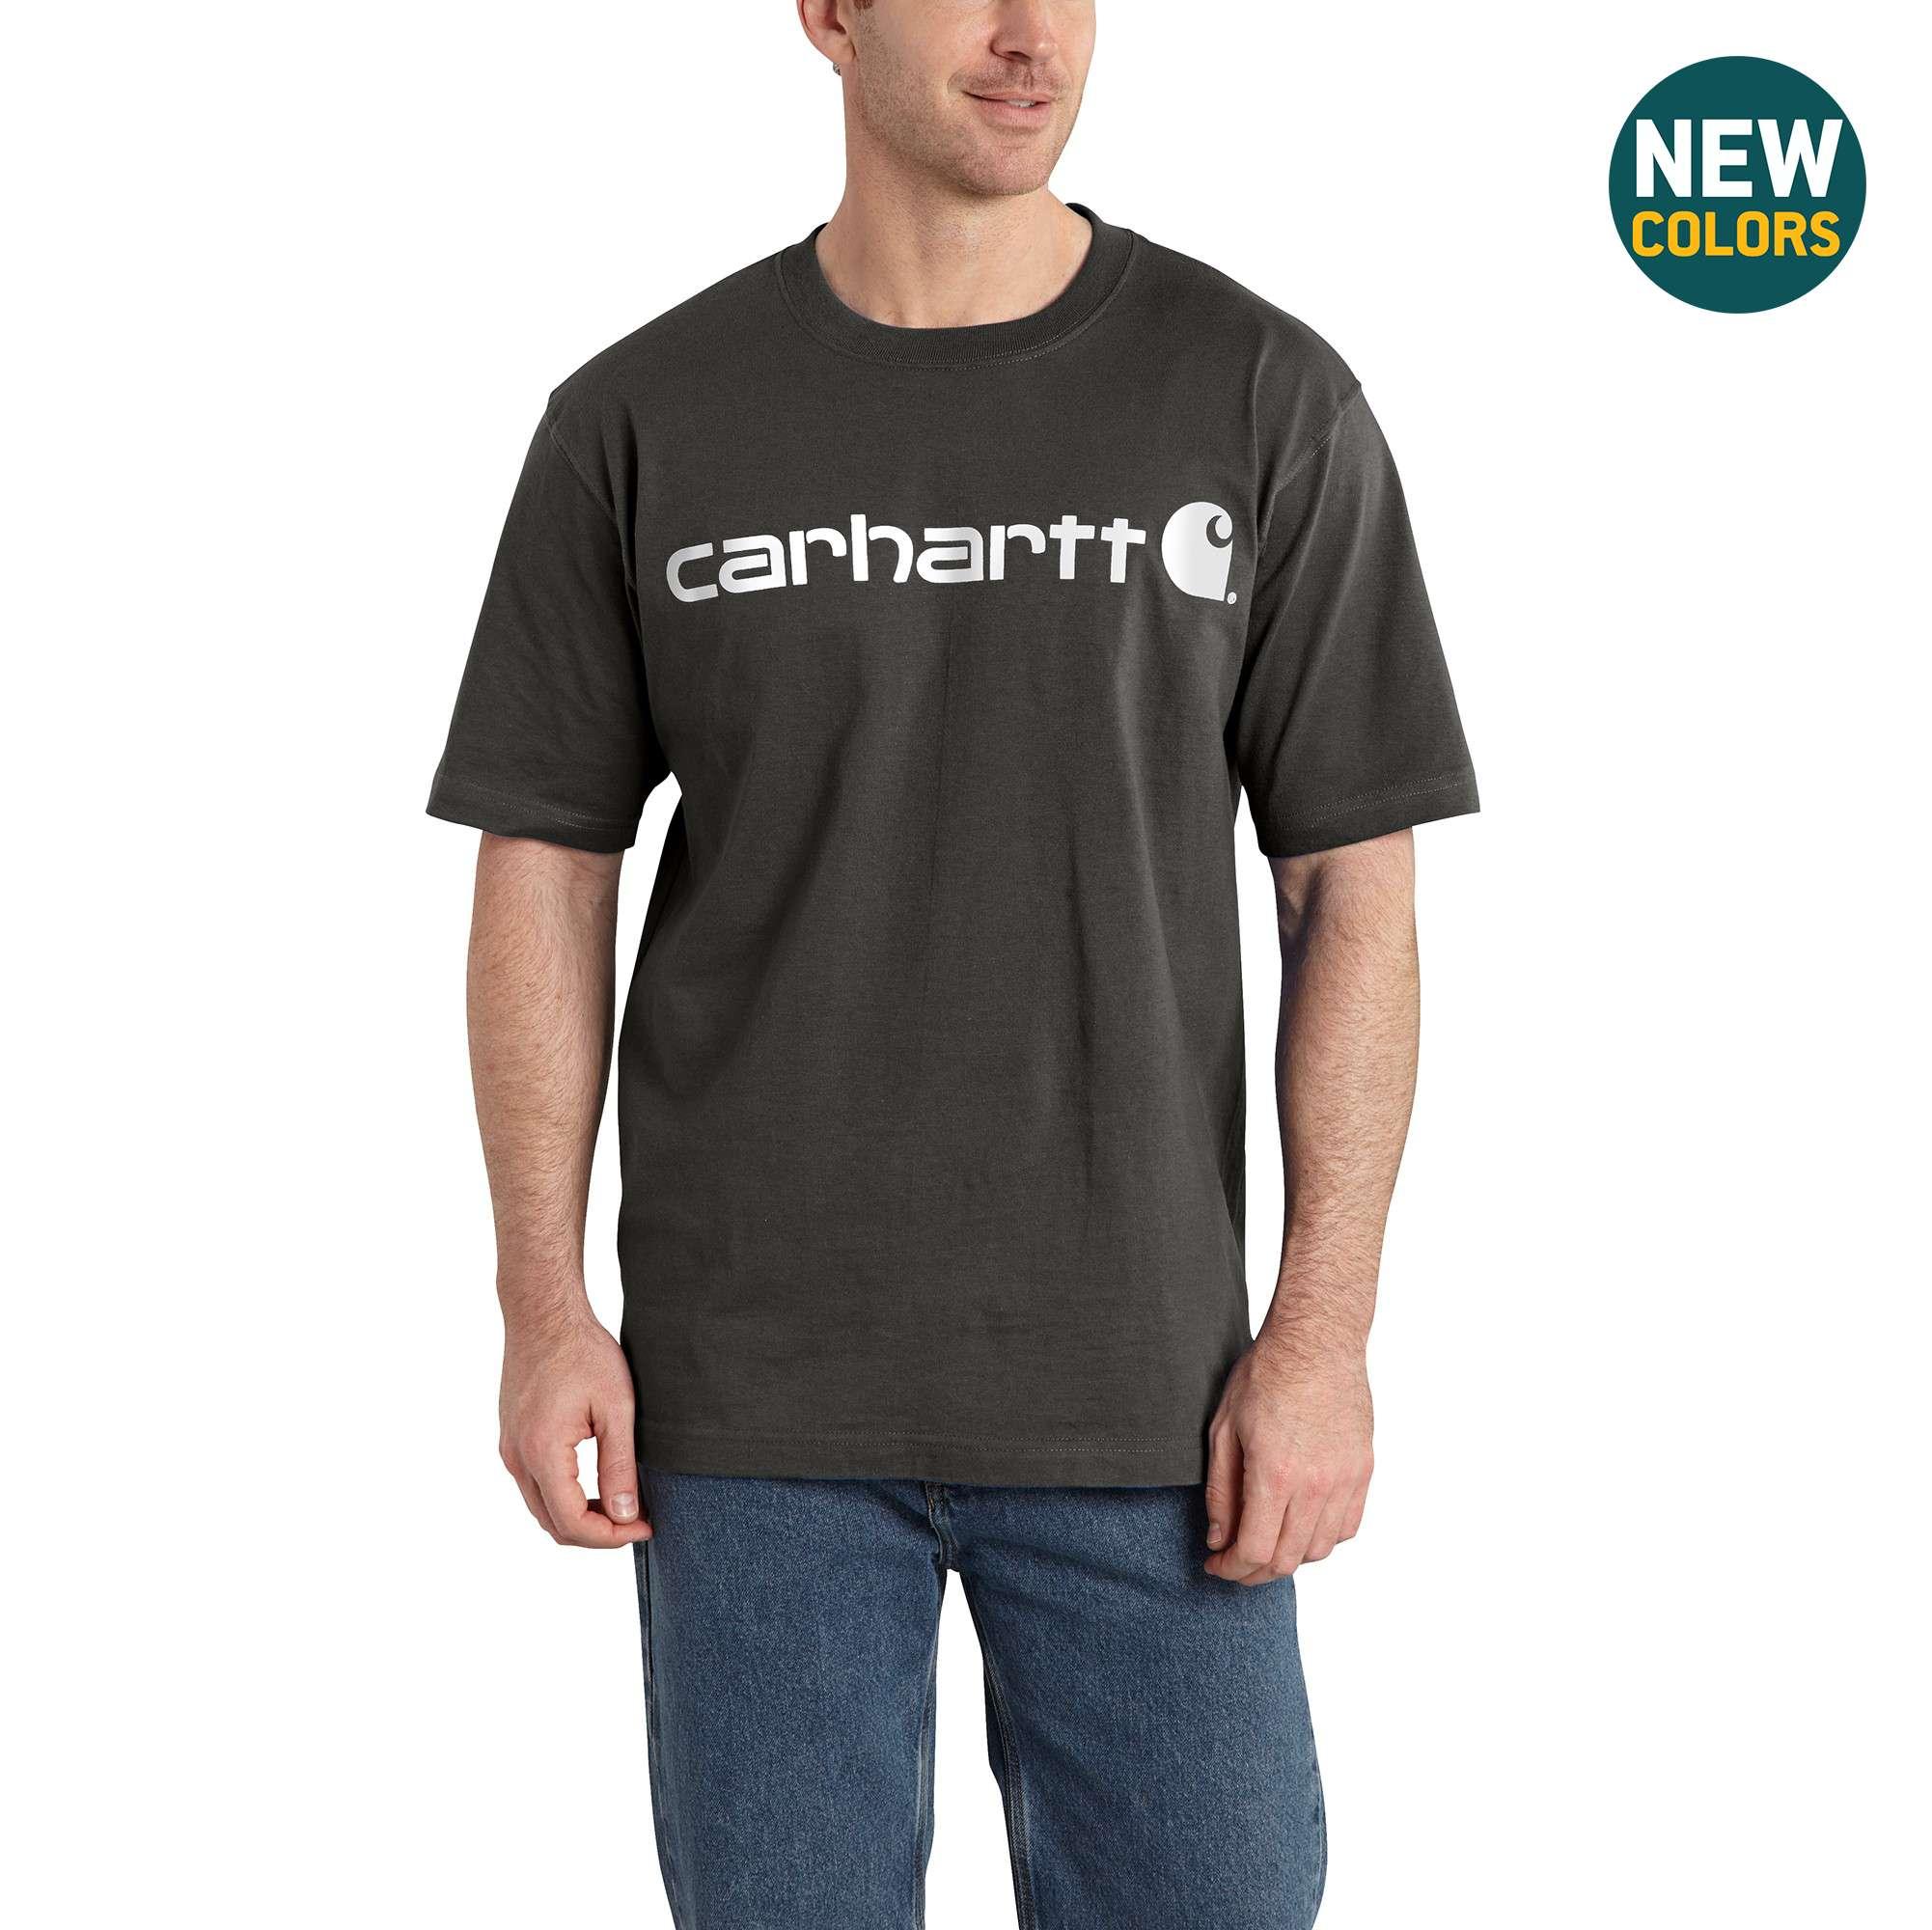 Carhartt Short-Sleeve Logo T-Shirt